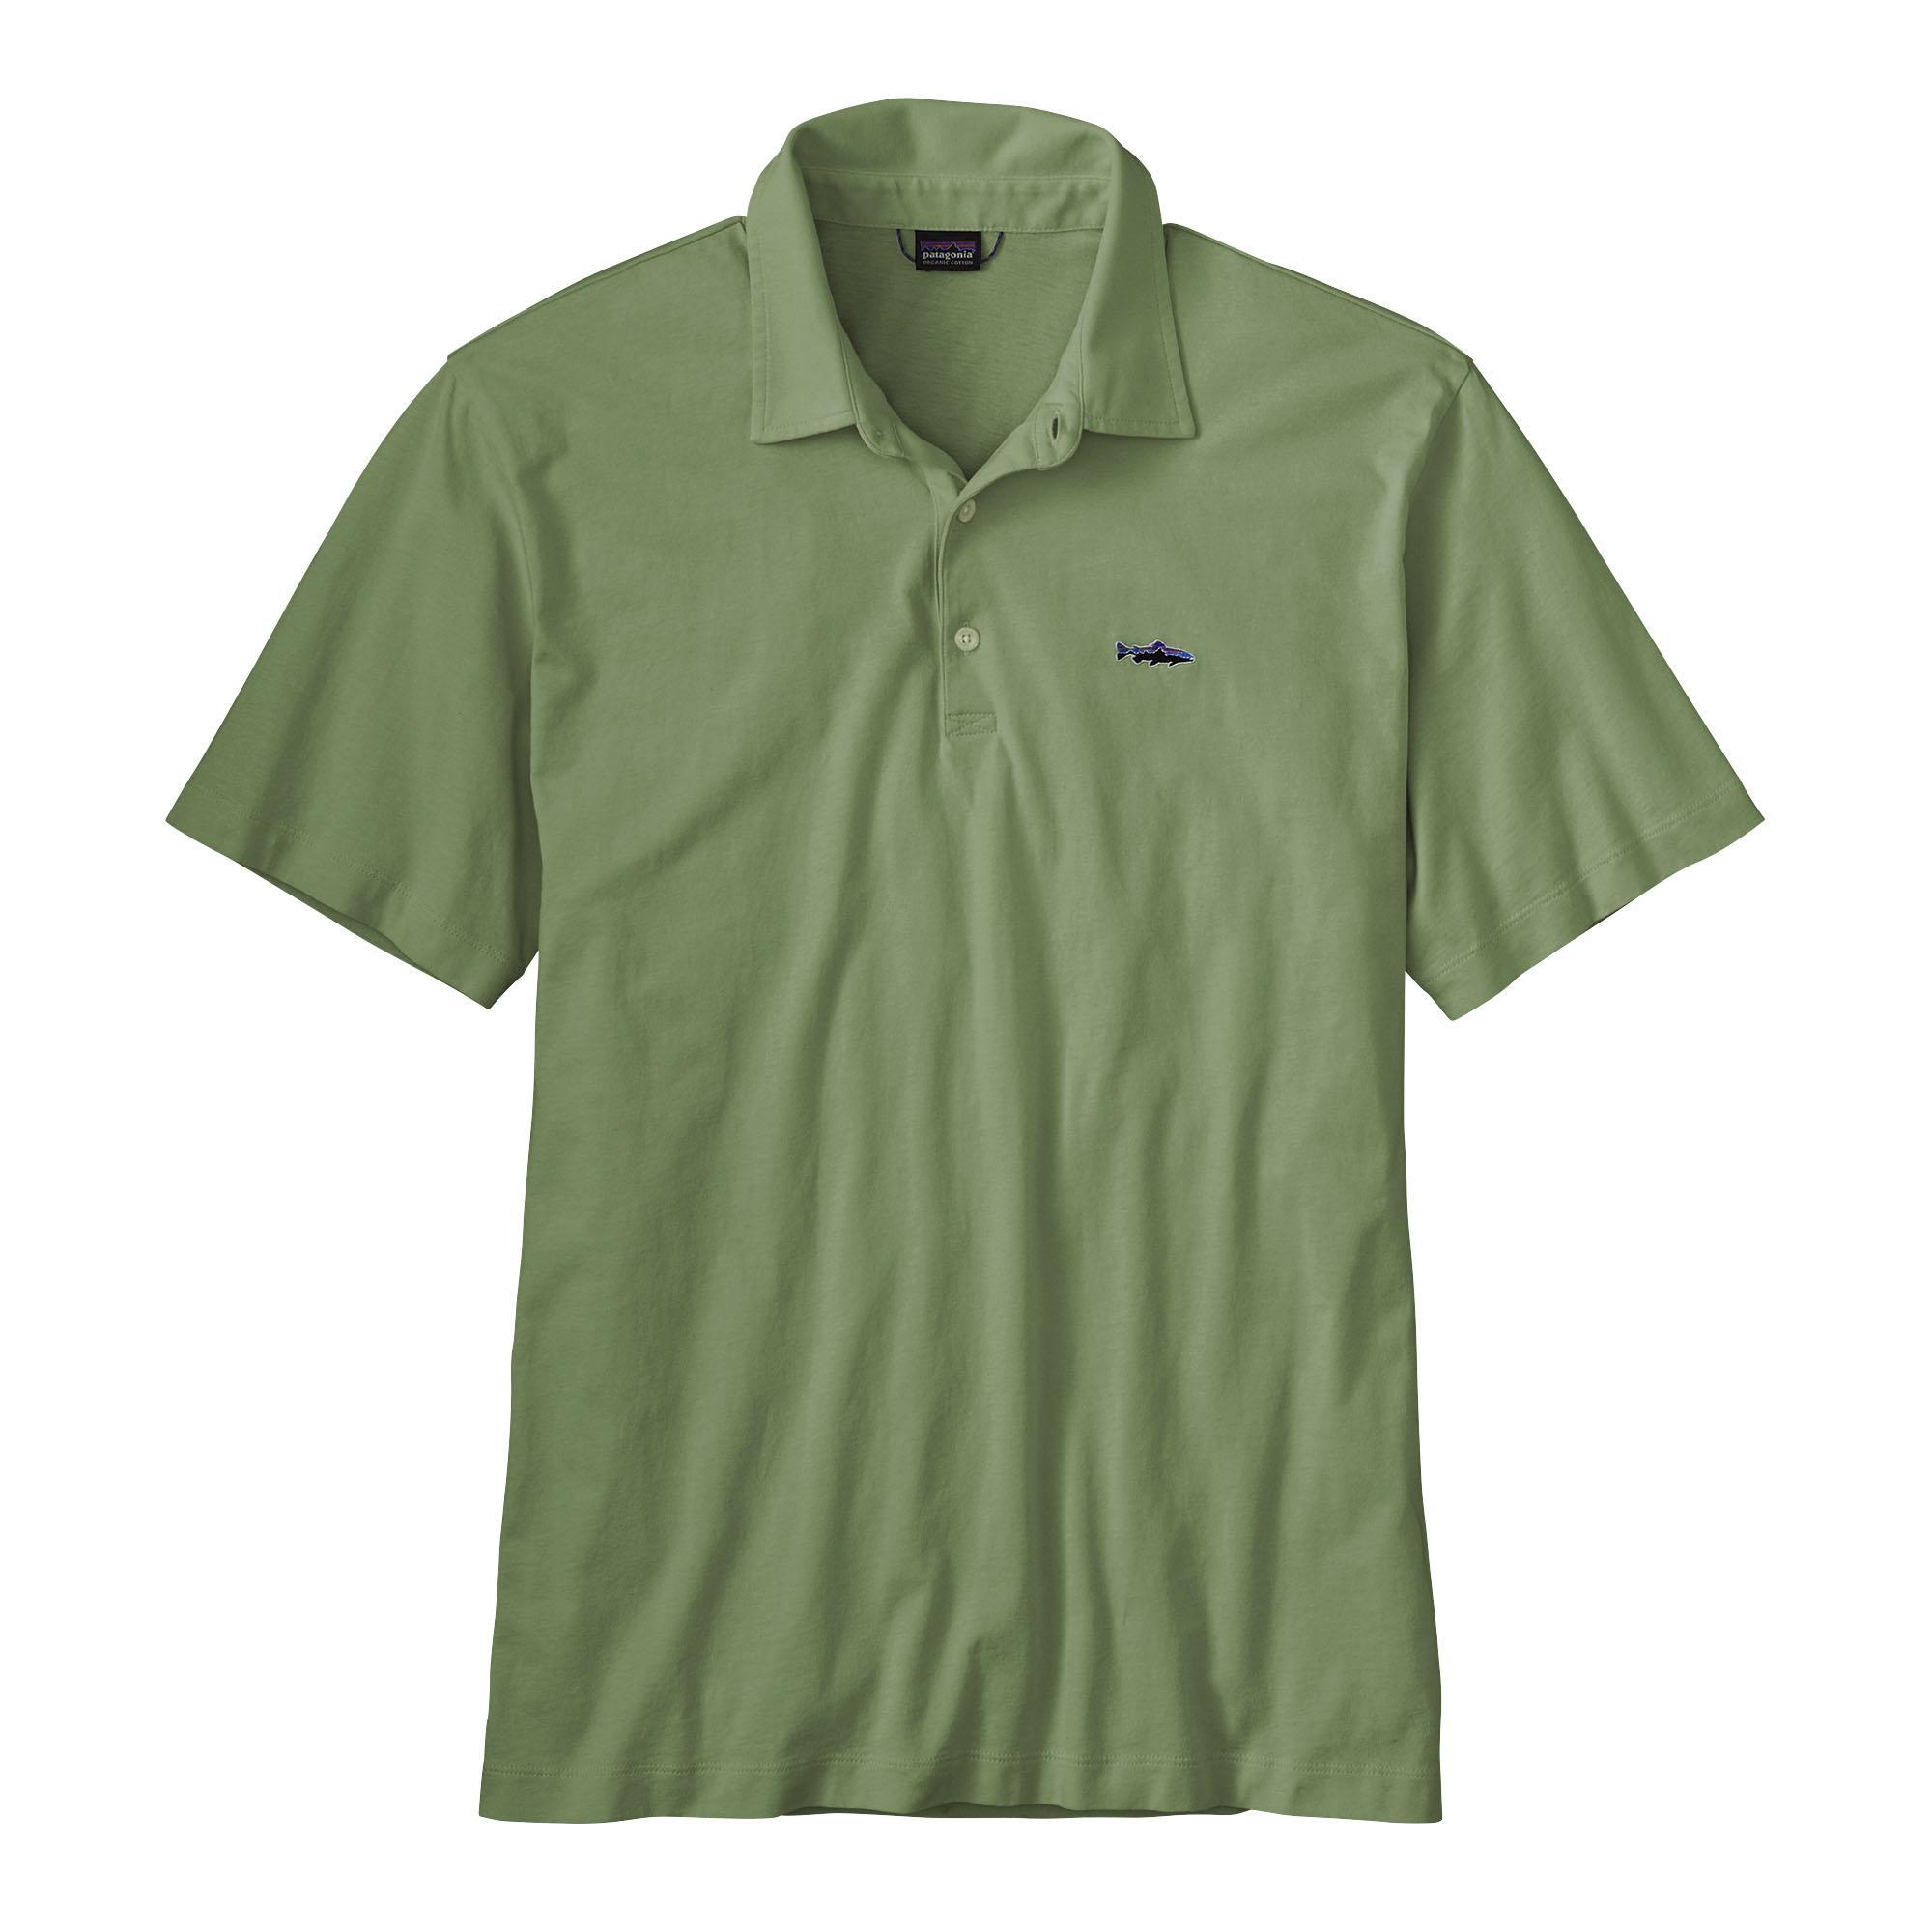 Patagonia Men's Polo- Trout Fitz Roy shirt TRNG_GREN